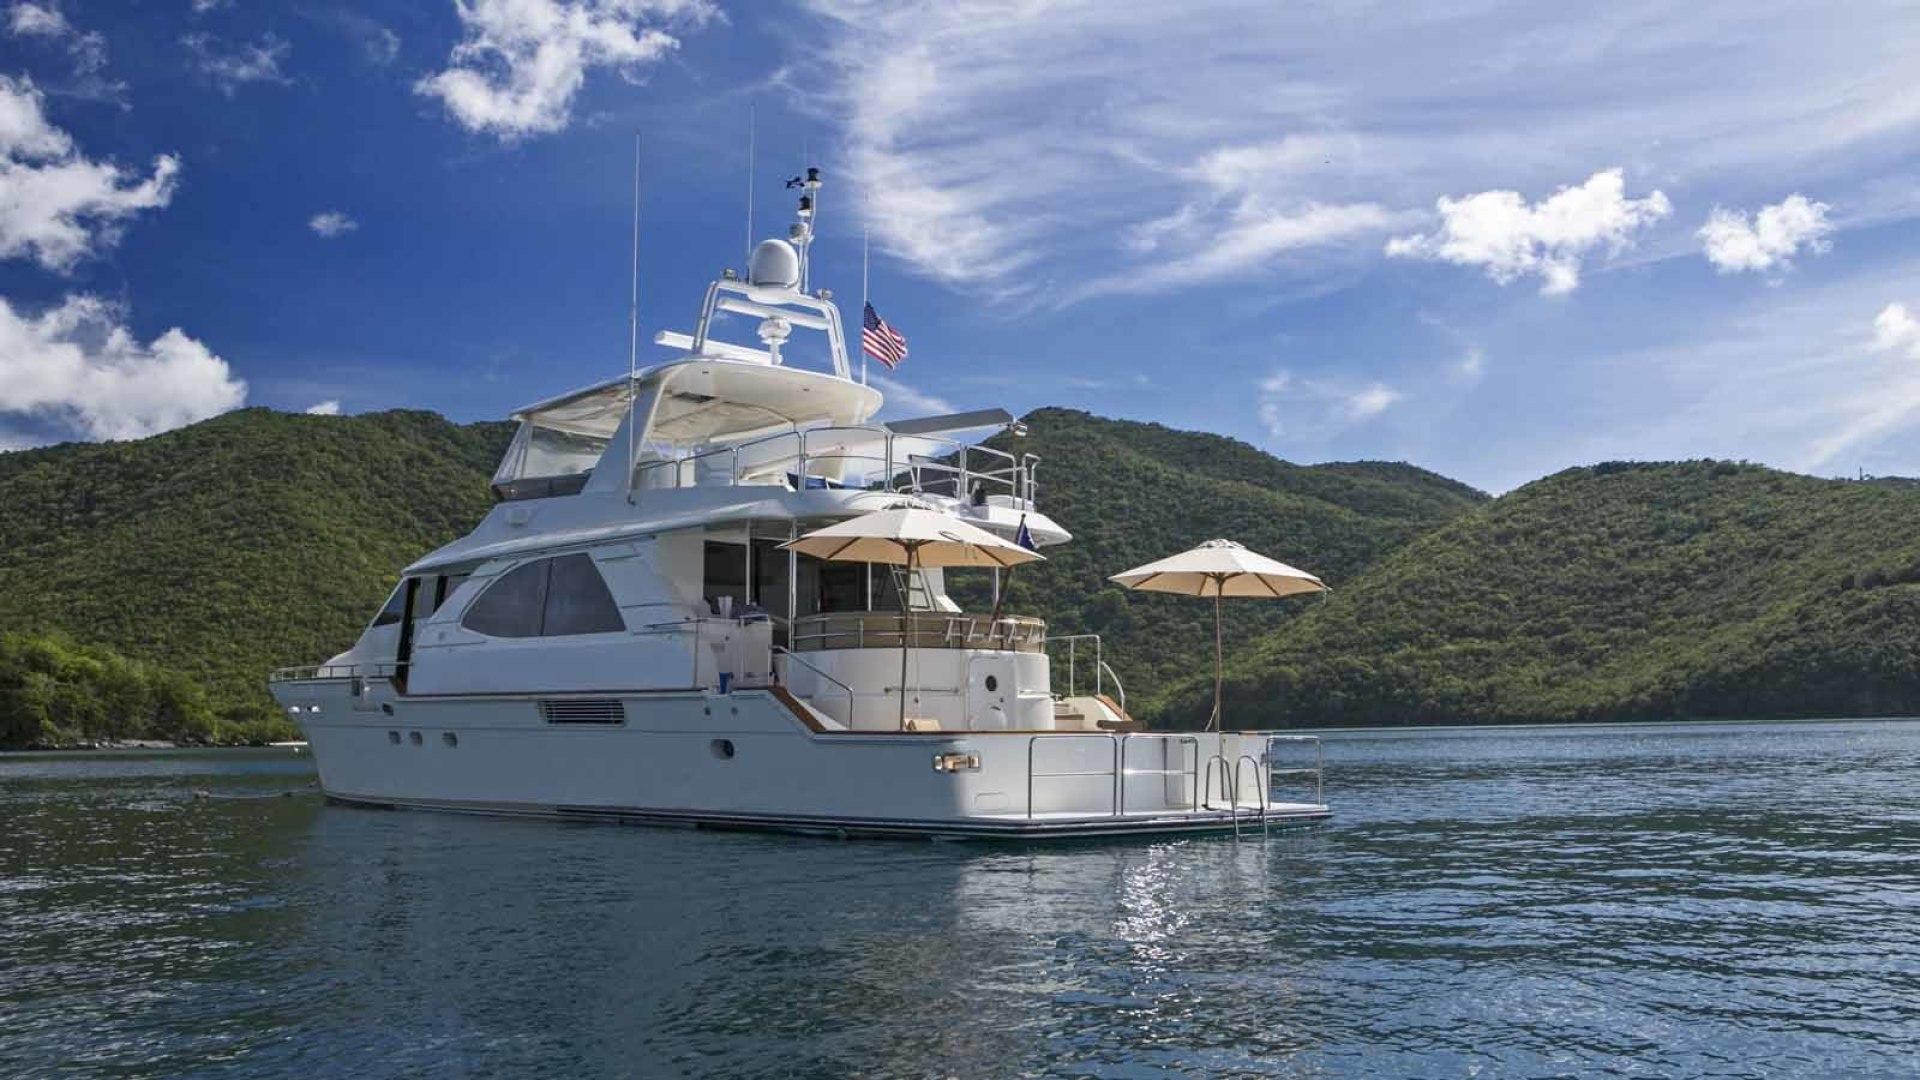 Queenship-Barretta 76 2004-SEA MYSTIC Fort Myers-Florida-United States-Stern Profile-1588170 | Thumbnail